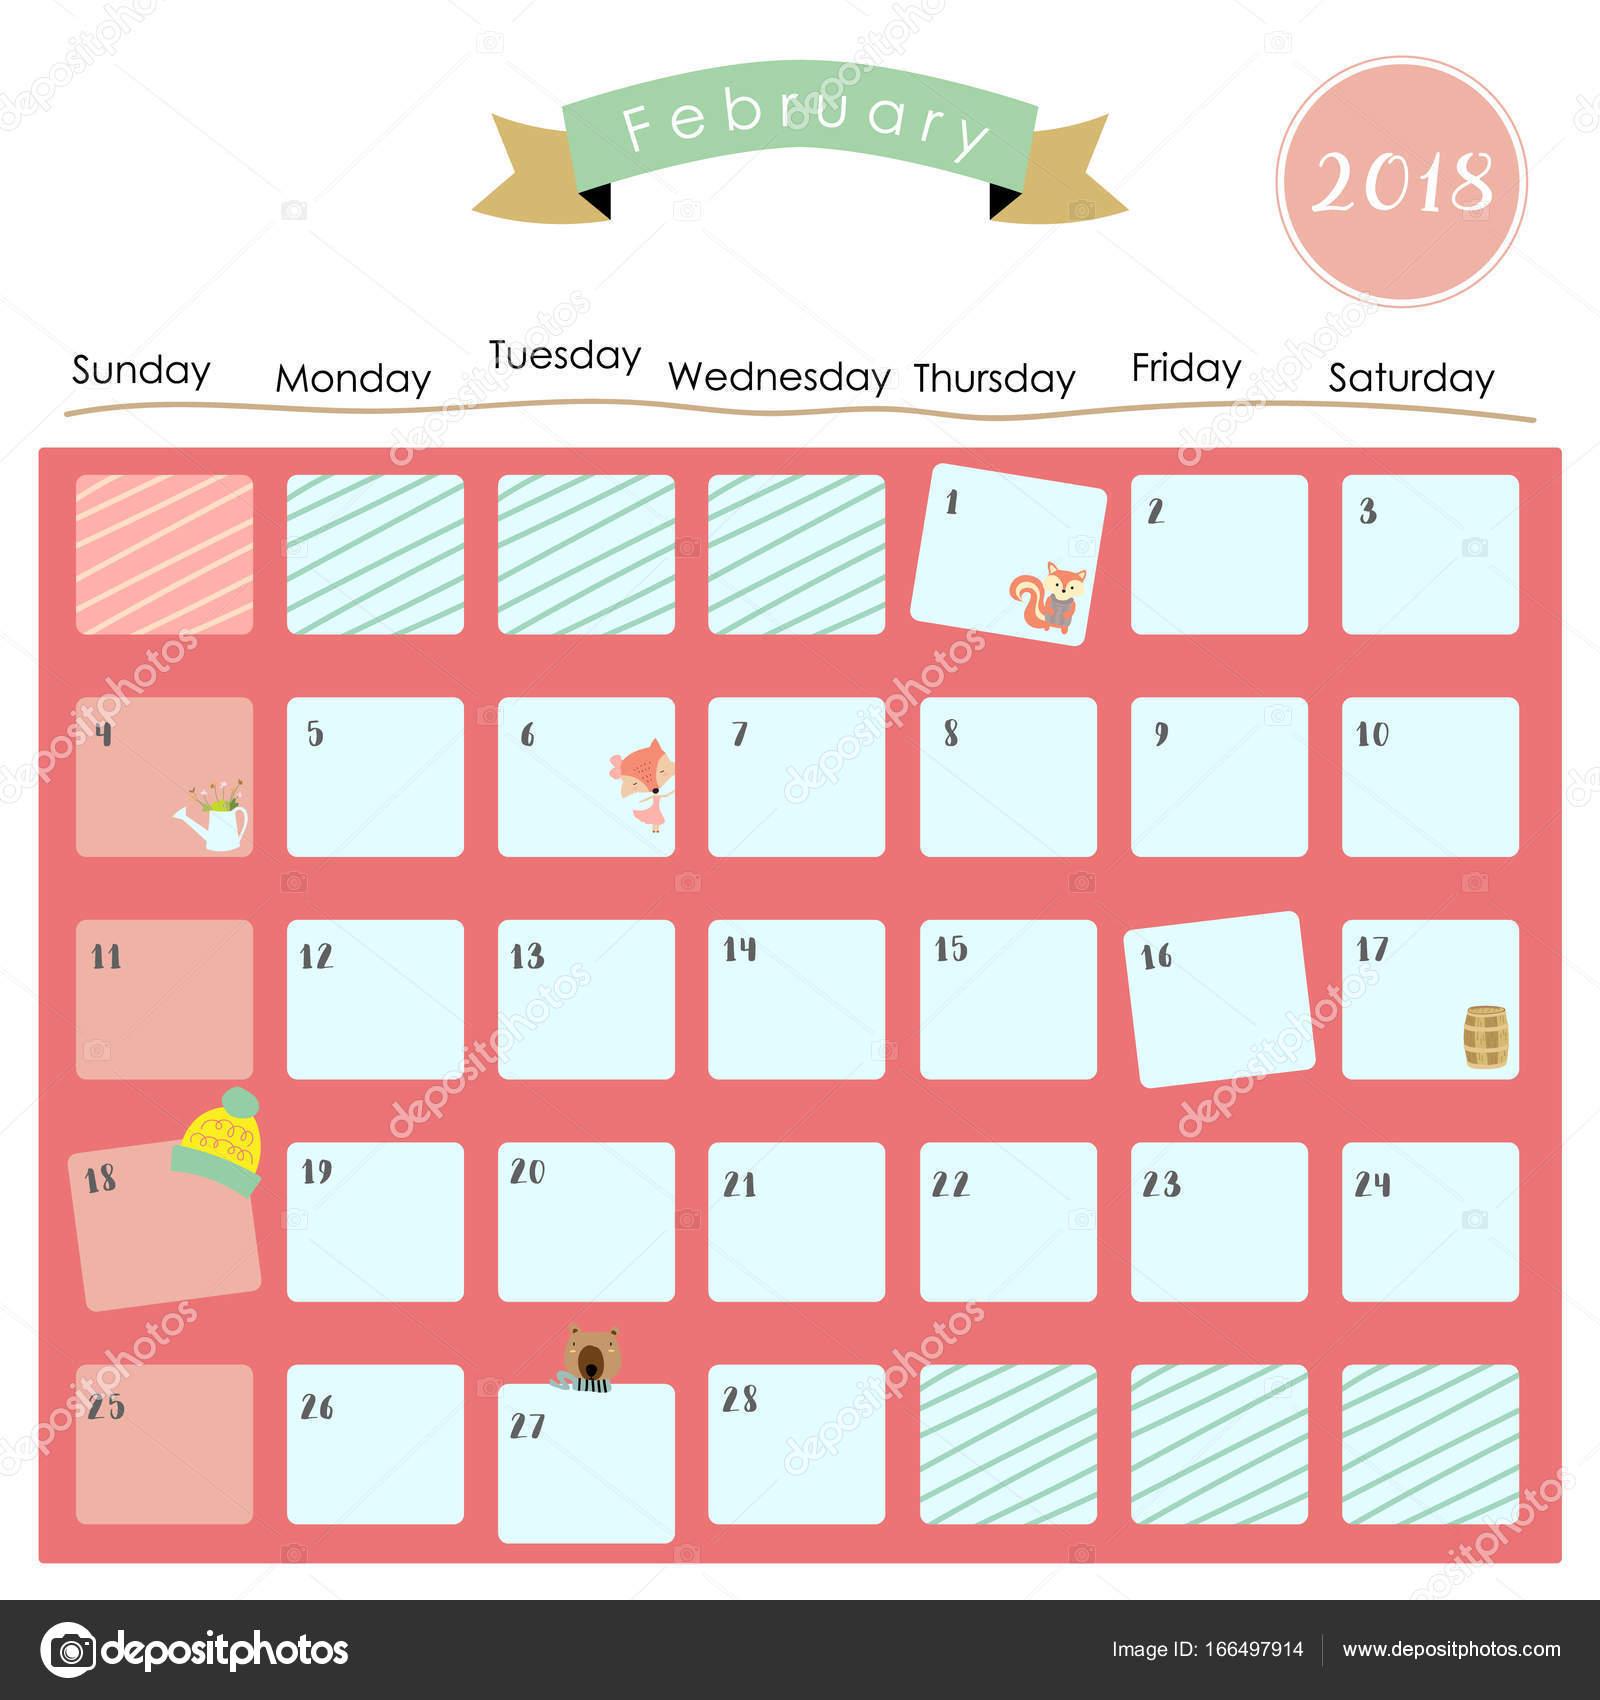 Cute Calendar February 2018 : Colorful cute february calendar with squirrel fox bear and